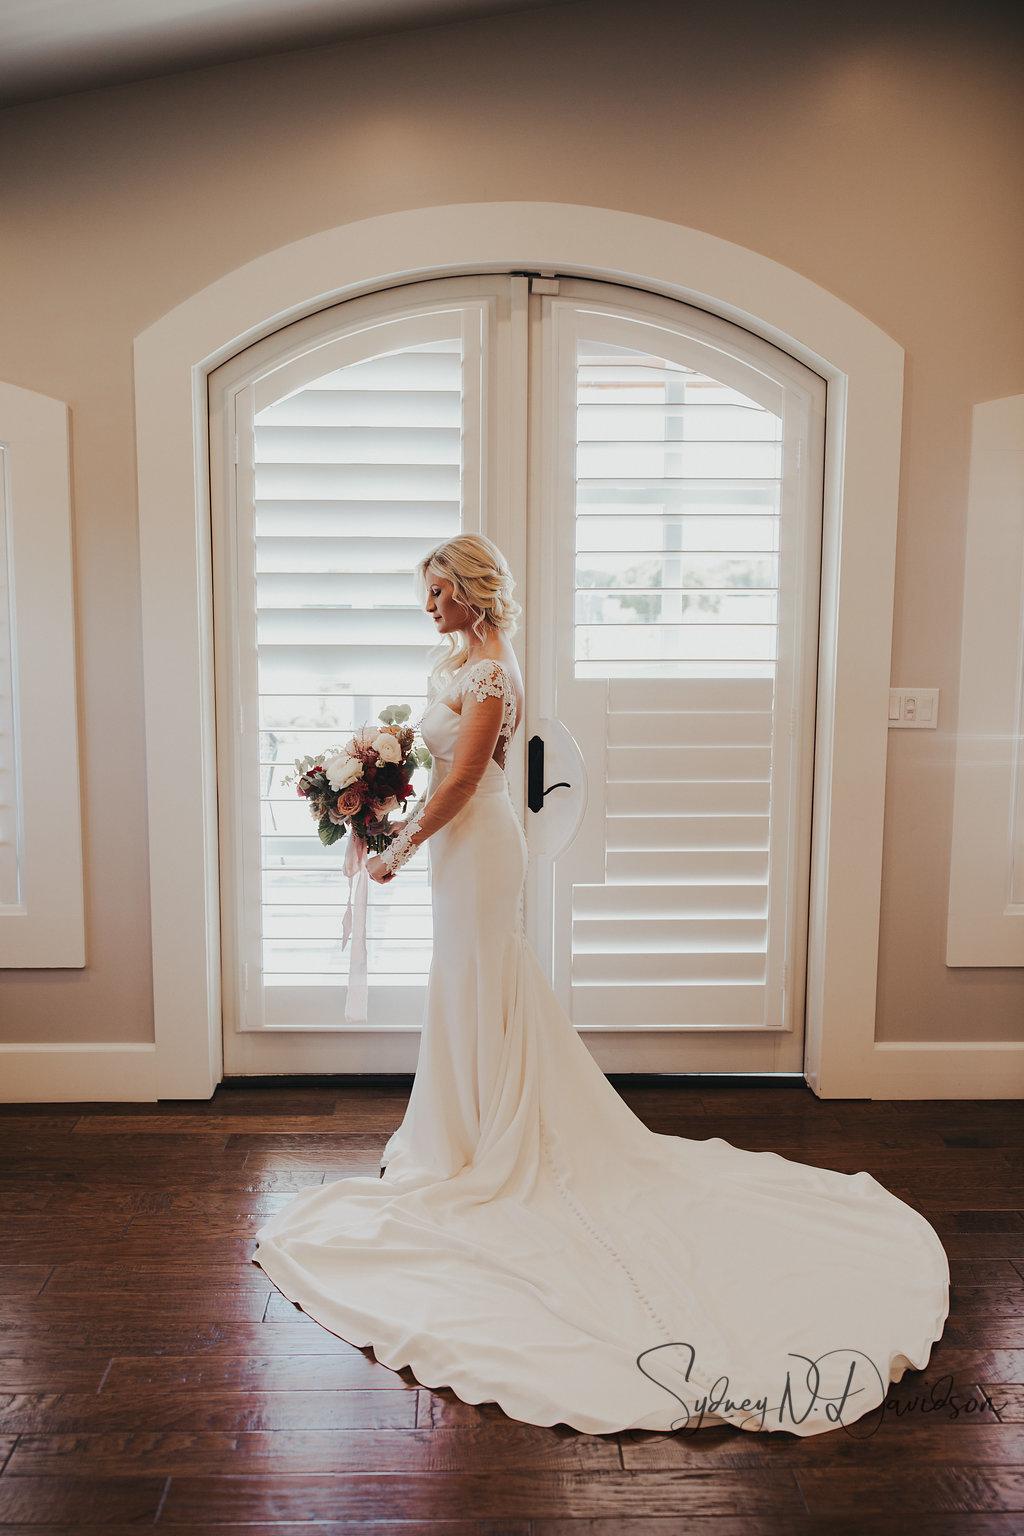 sydney-davidson-wedding-stillwater-oklahoma-wedding-session-traveling-photographer-portrait-tulsa-oklahoma-1682.jpg